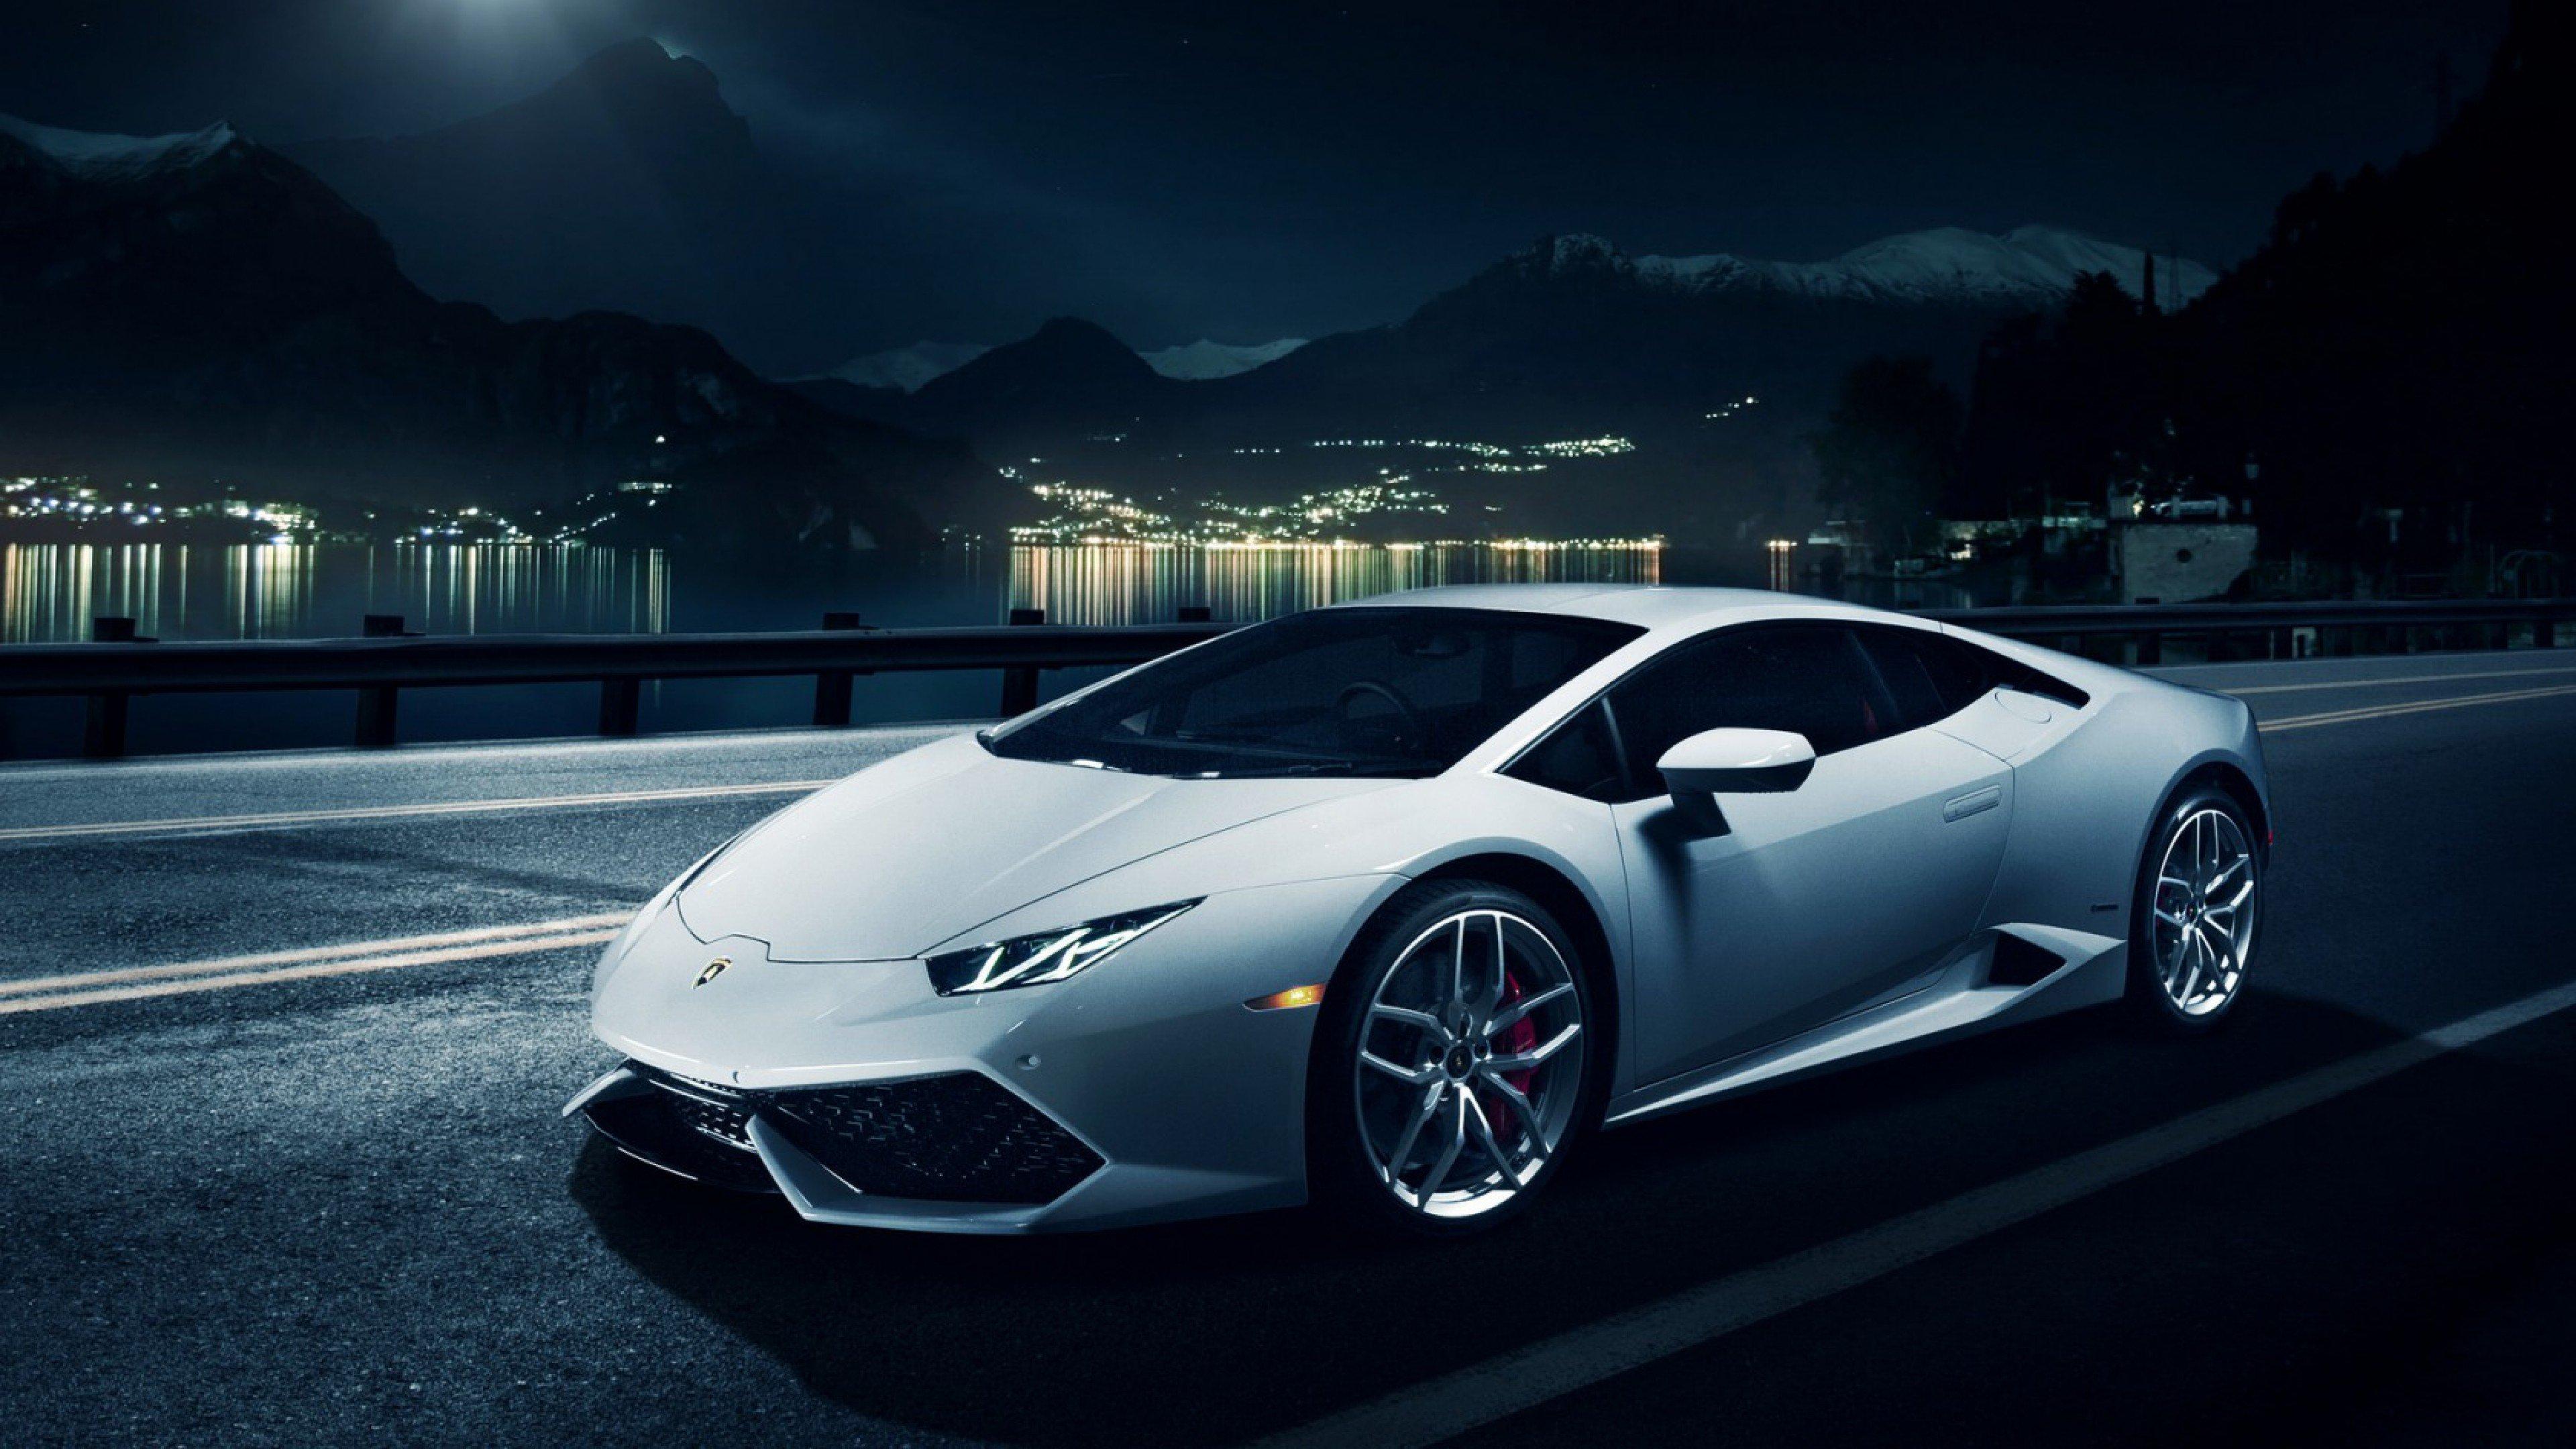 Lamborghini Huracan Wallpaper 22   3840 X 2160 stmednet 3840x2160